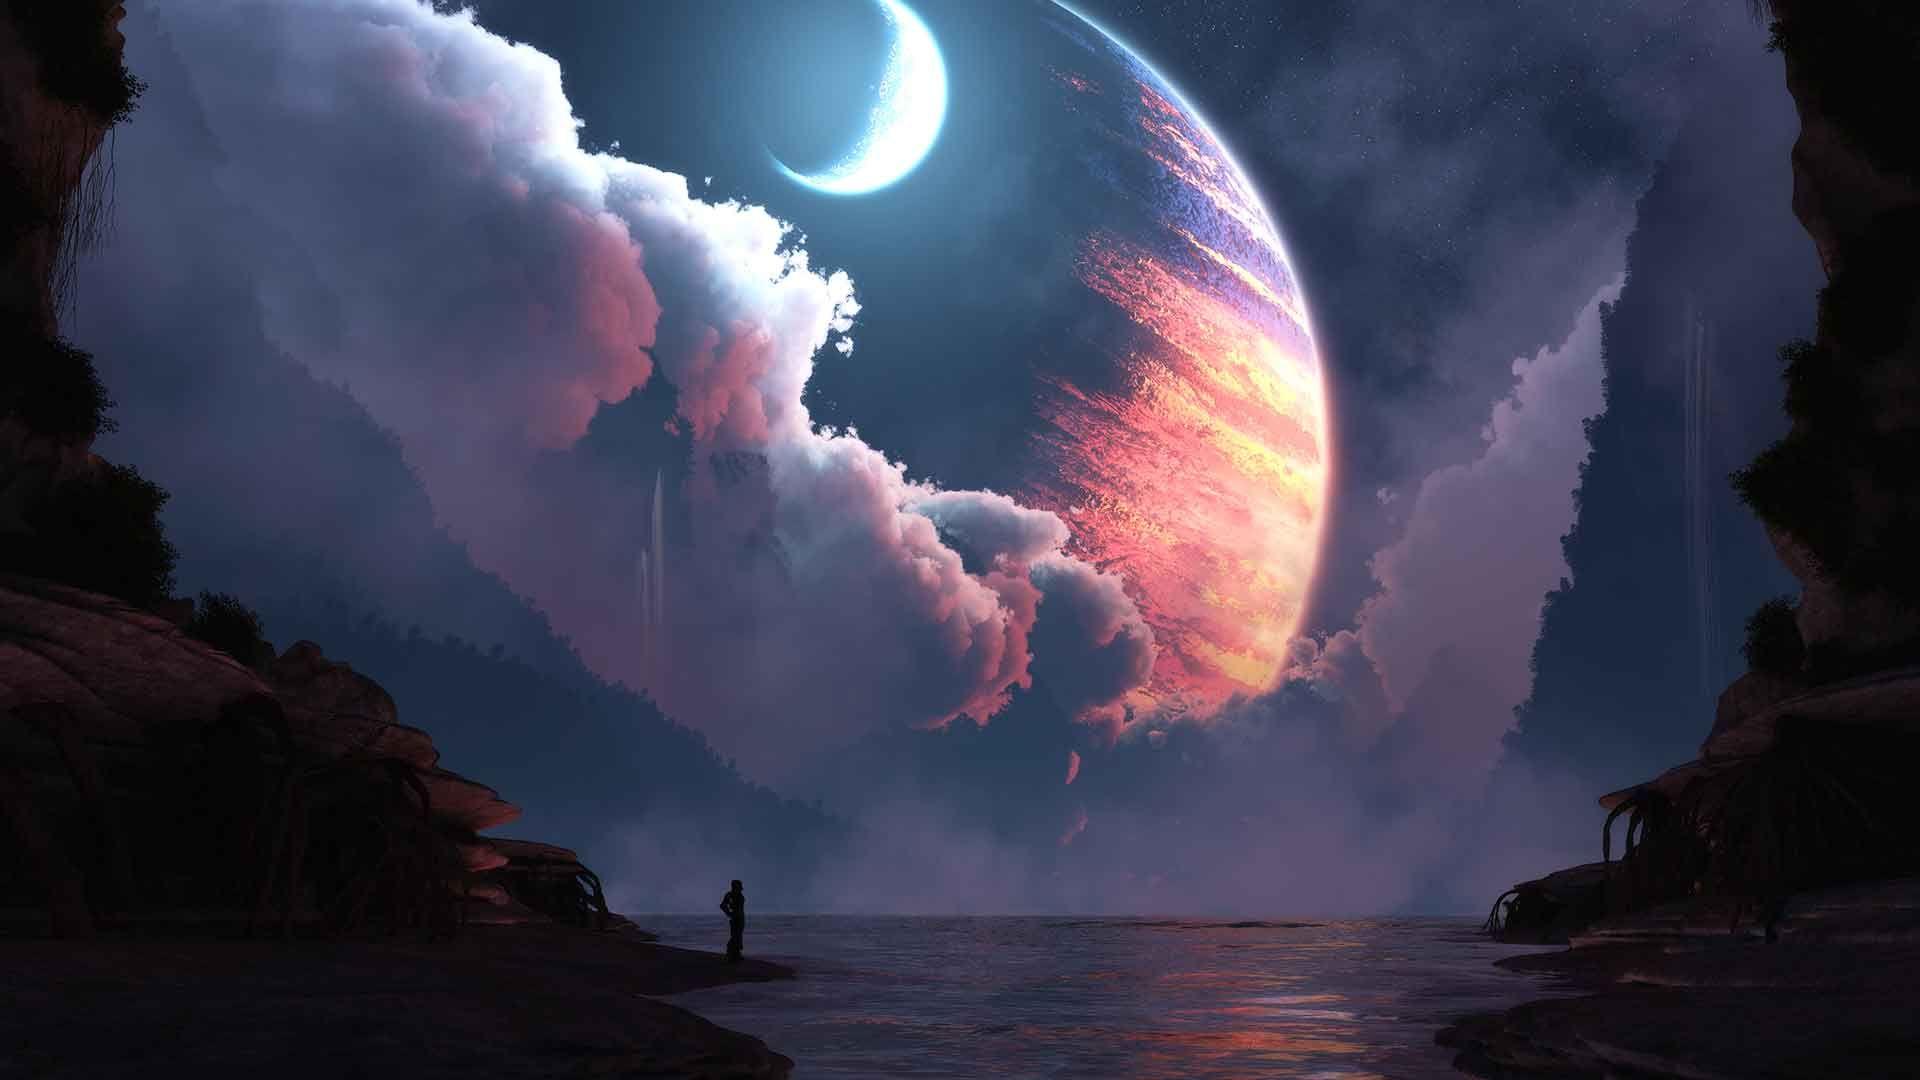 Dreamer Static Theme – Digital Blasphemy. [1920×1080] 4K